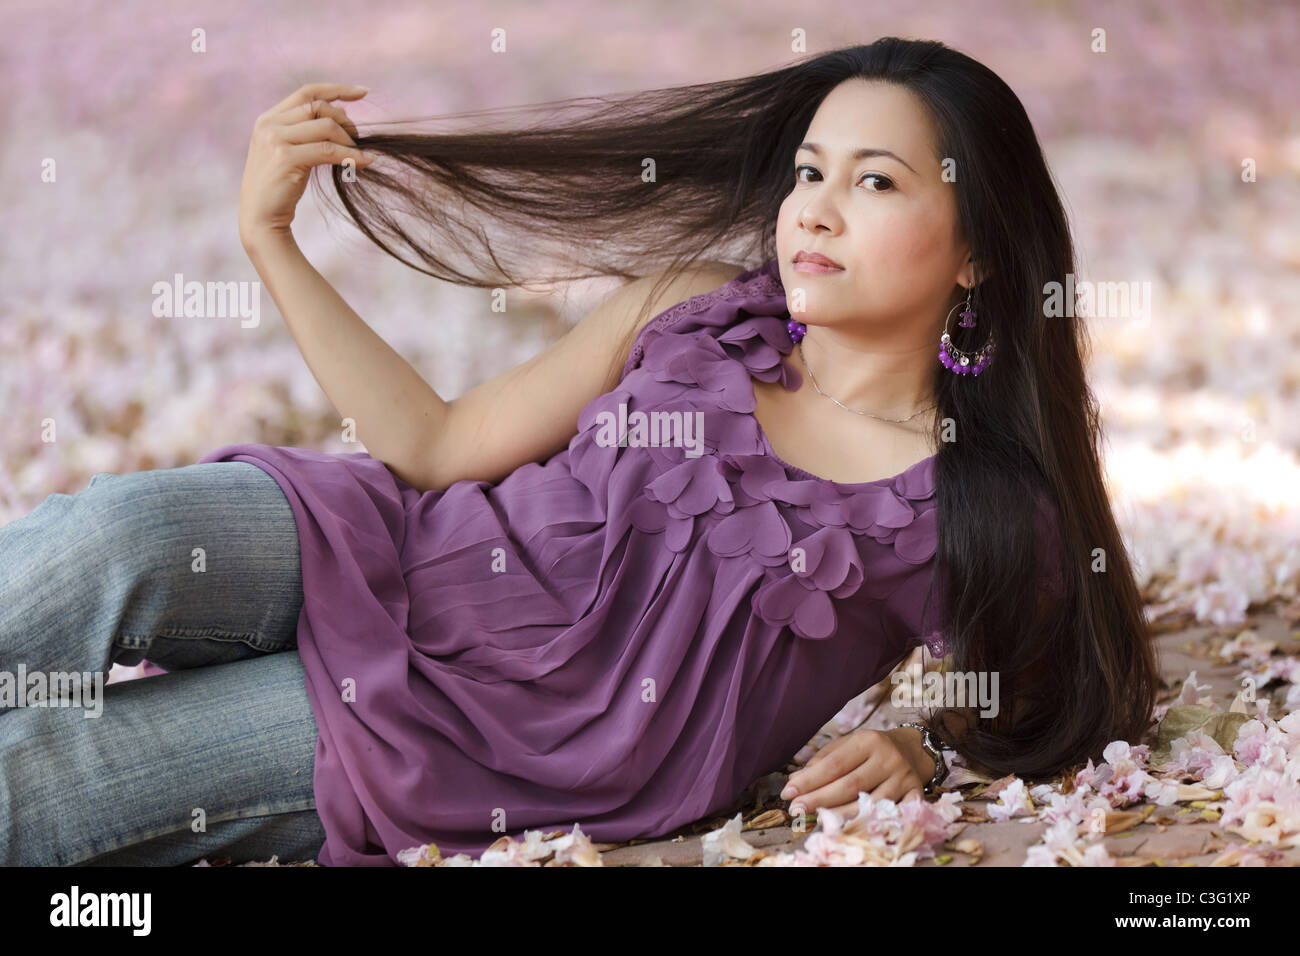 https://c8.alamy.com/comp/C3G1XP/beautiful-asian-thai-woman-lying-on-flowers-and-pulling-long-hair-C3G1XP.jpg